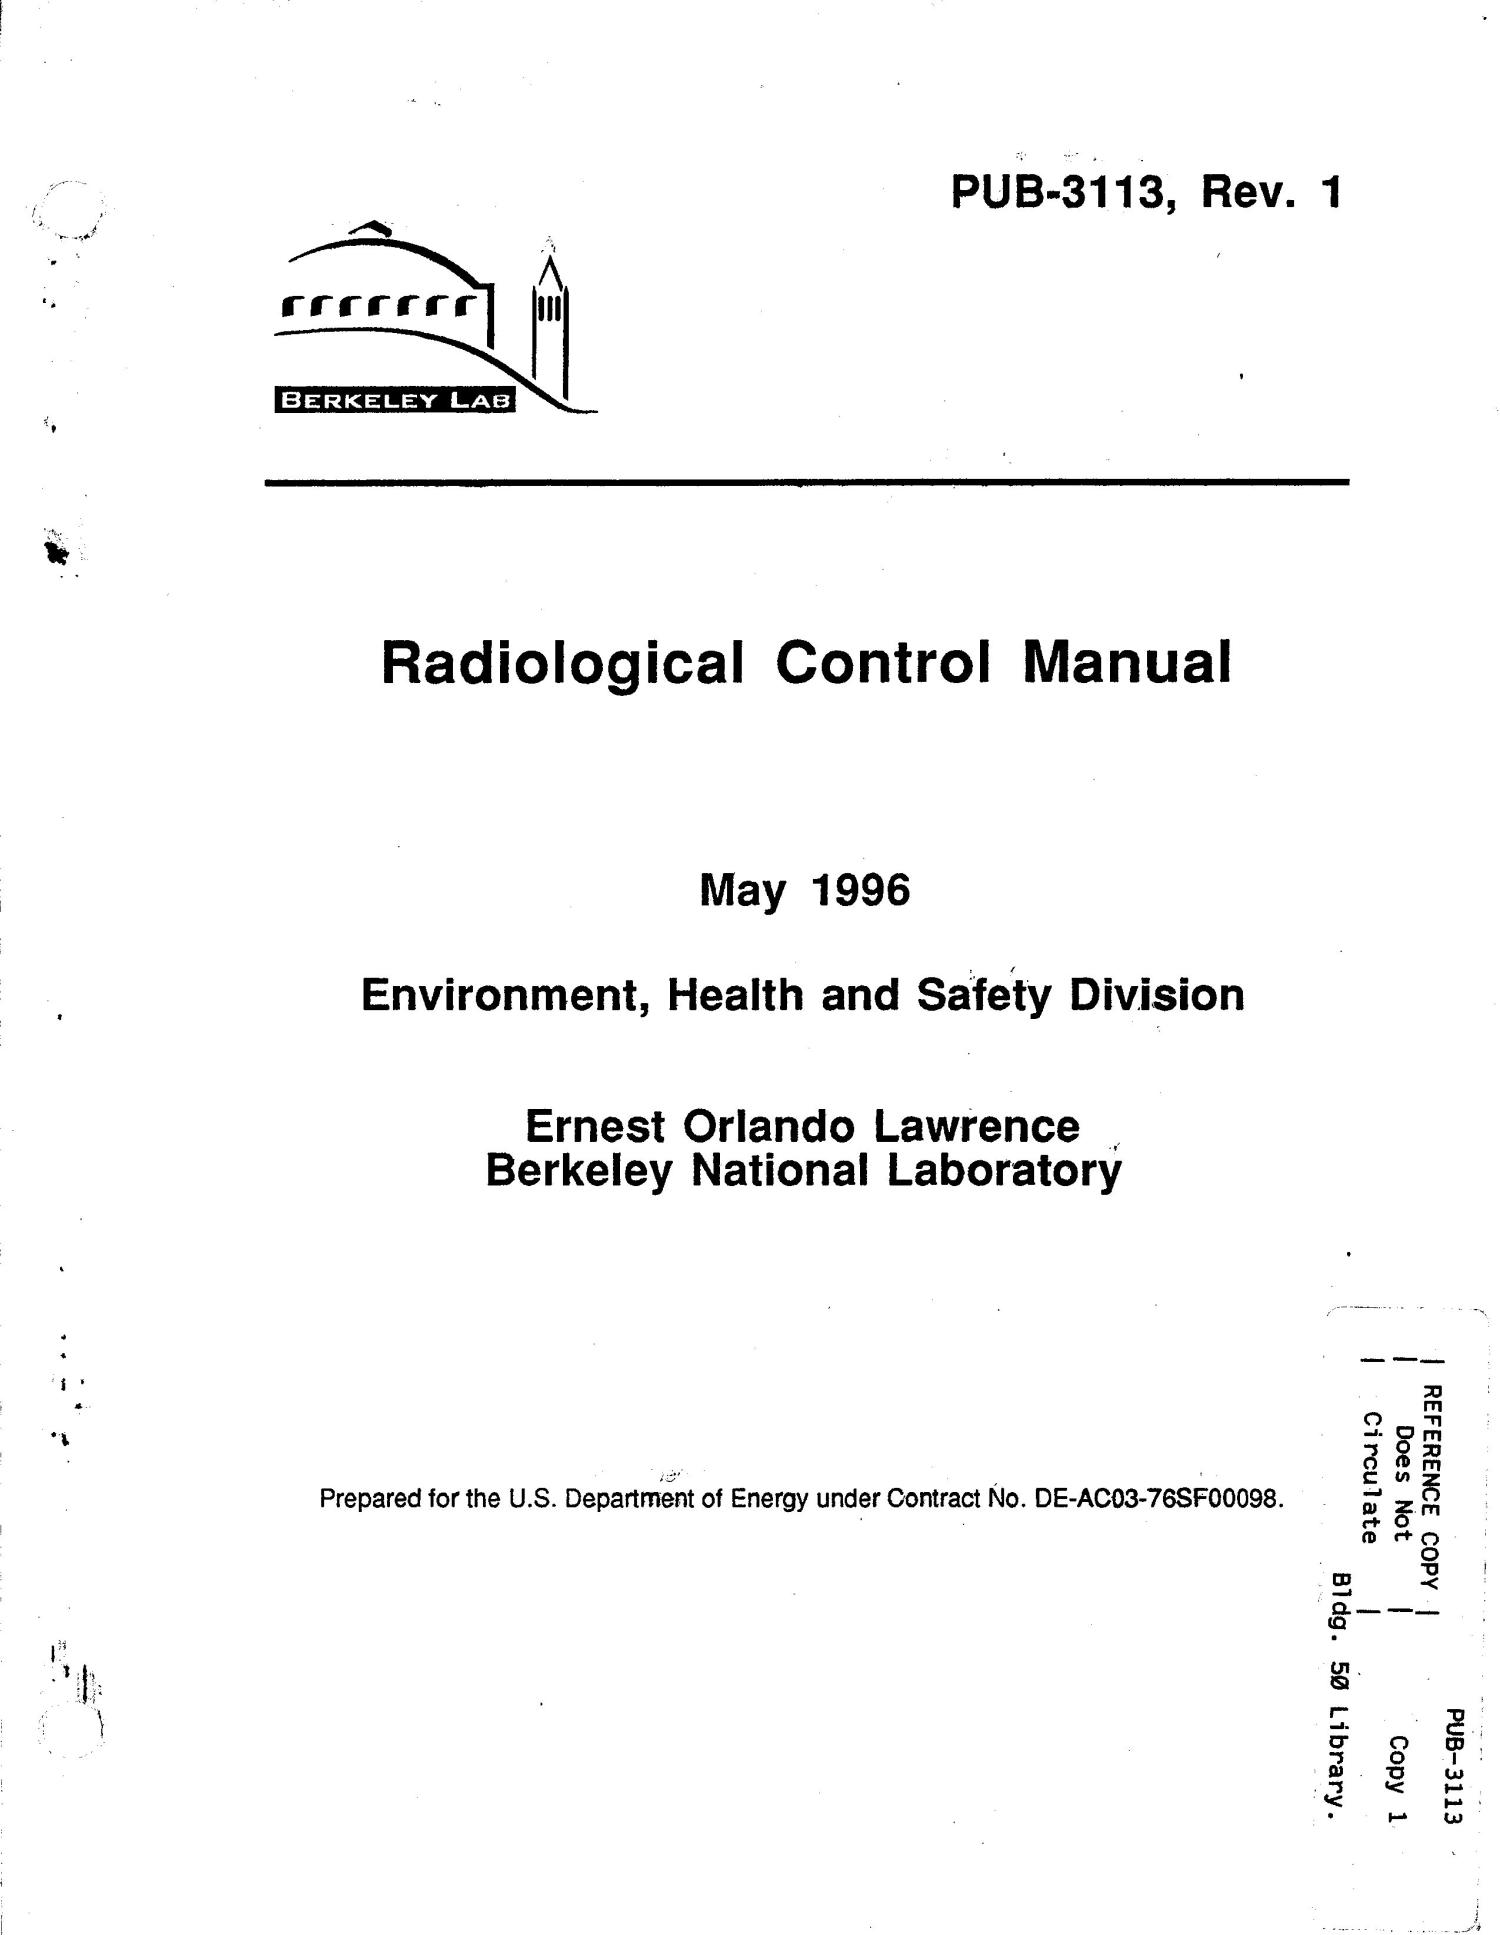 radiological control manual revision 1 digital library rh digital library unt edu department of energy radiological control manual radiological control manual standard